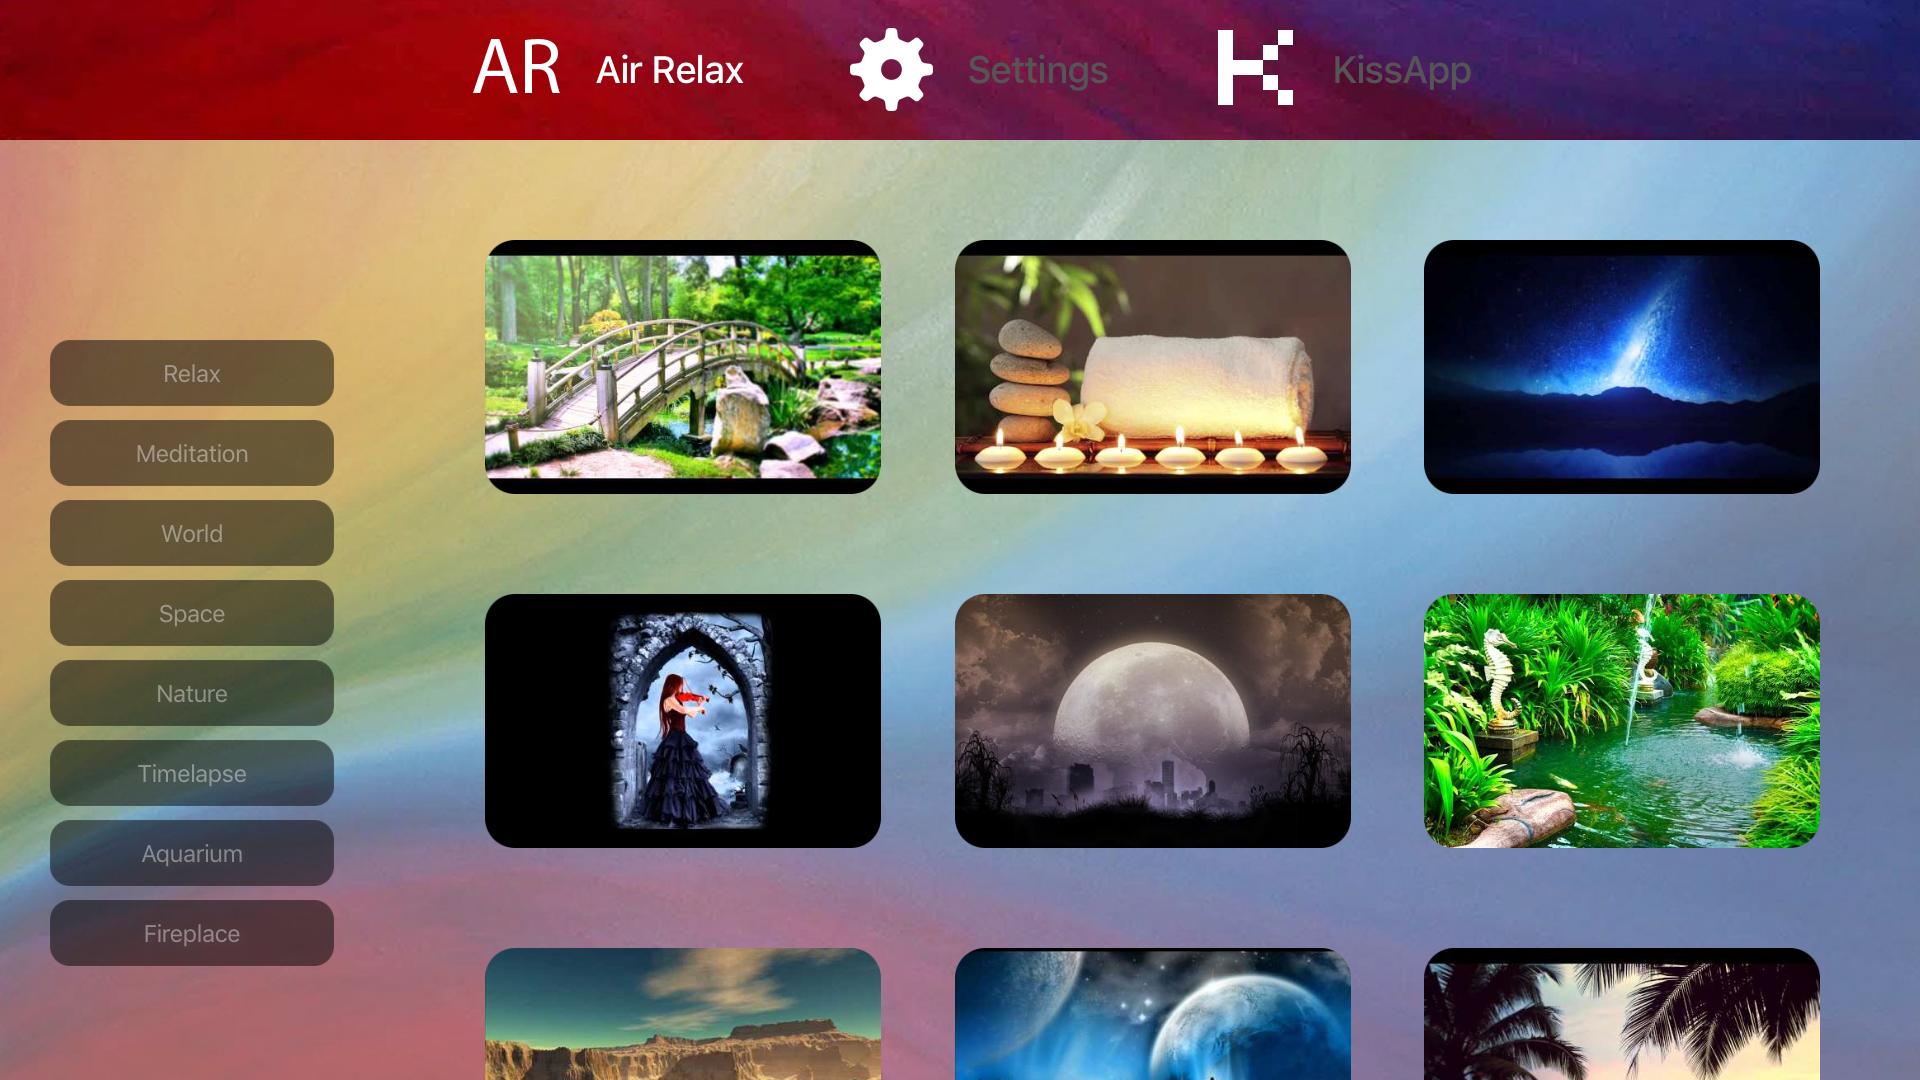 Aquariums Fireplaces AIR RELAX screenshot 11